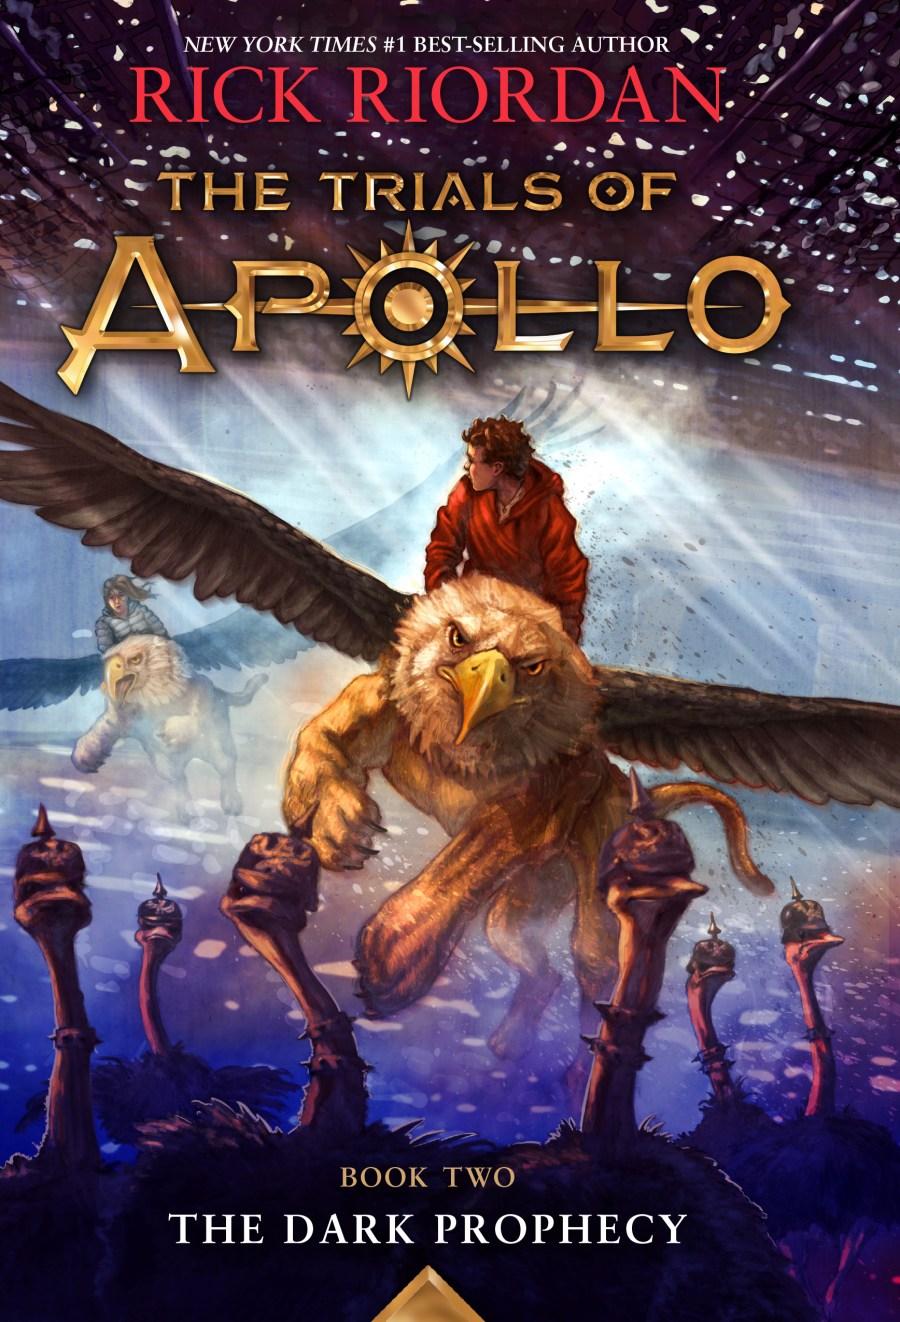 The Dark Prophecy-The Trials of Apollo Book 2 by Rick Riordan